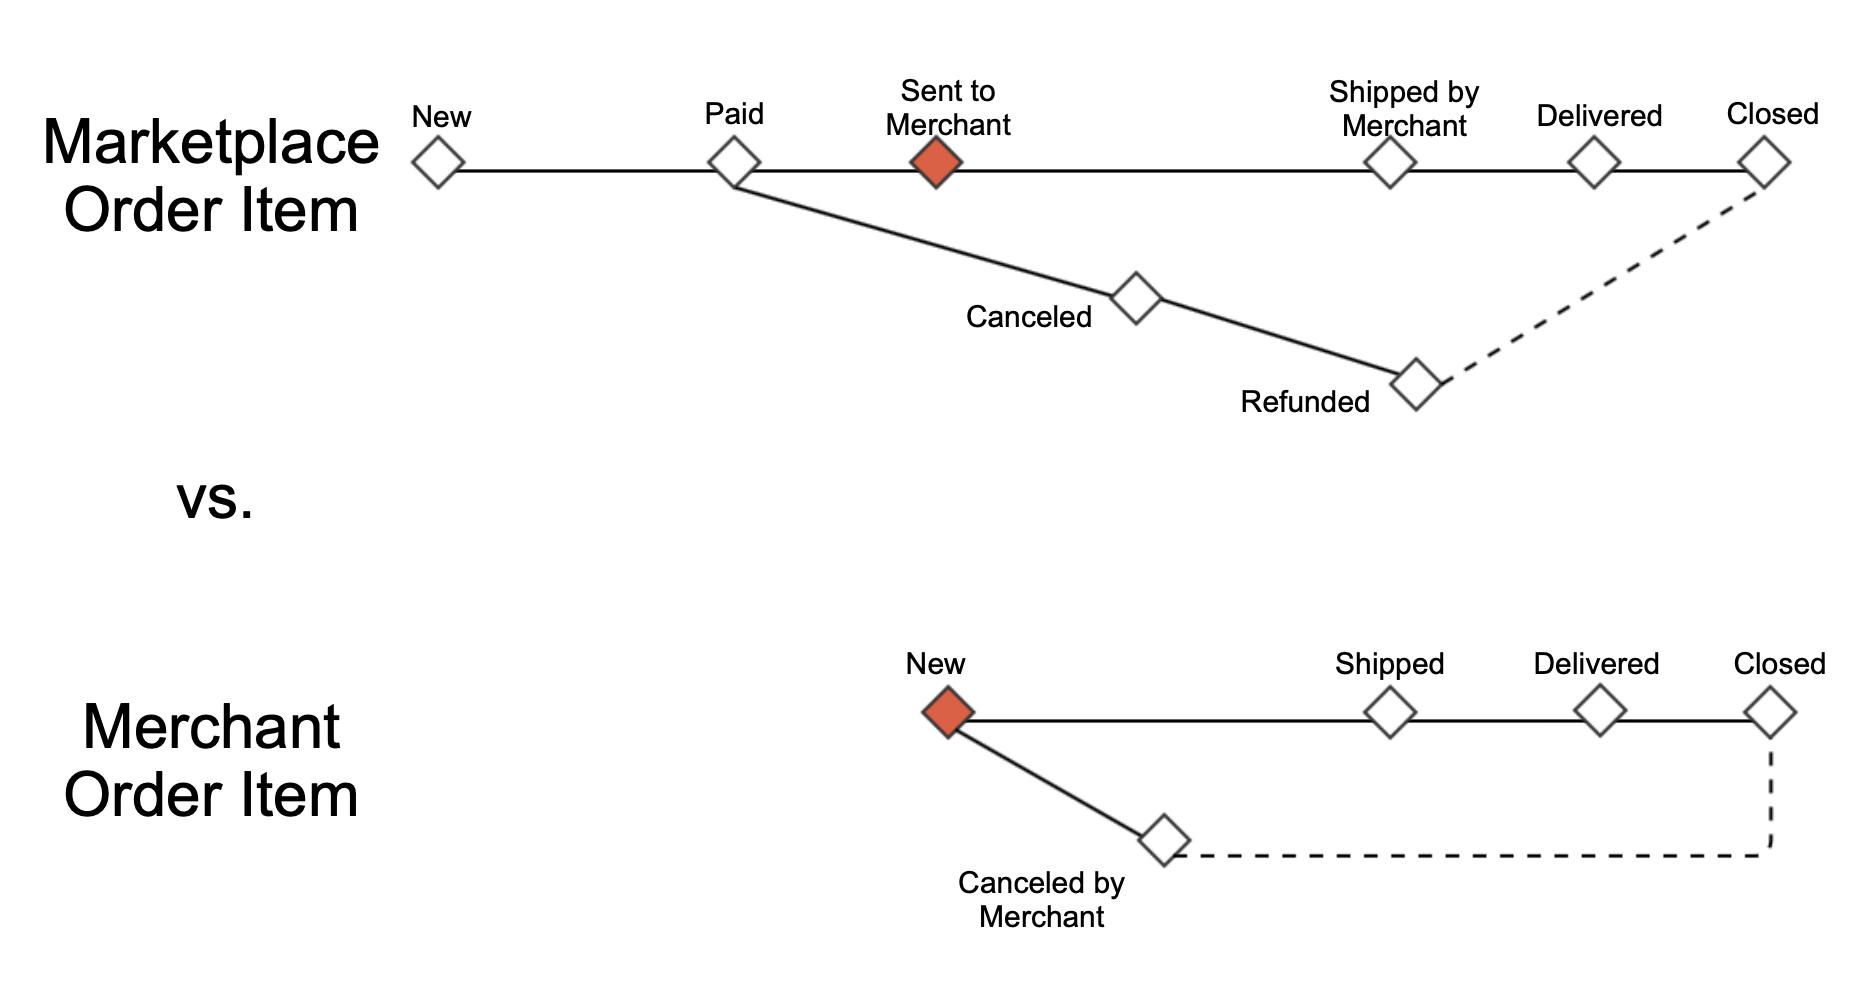 Order item's status progress: Sent to Merchant